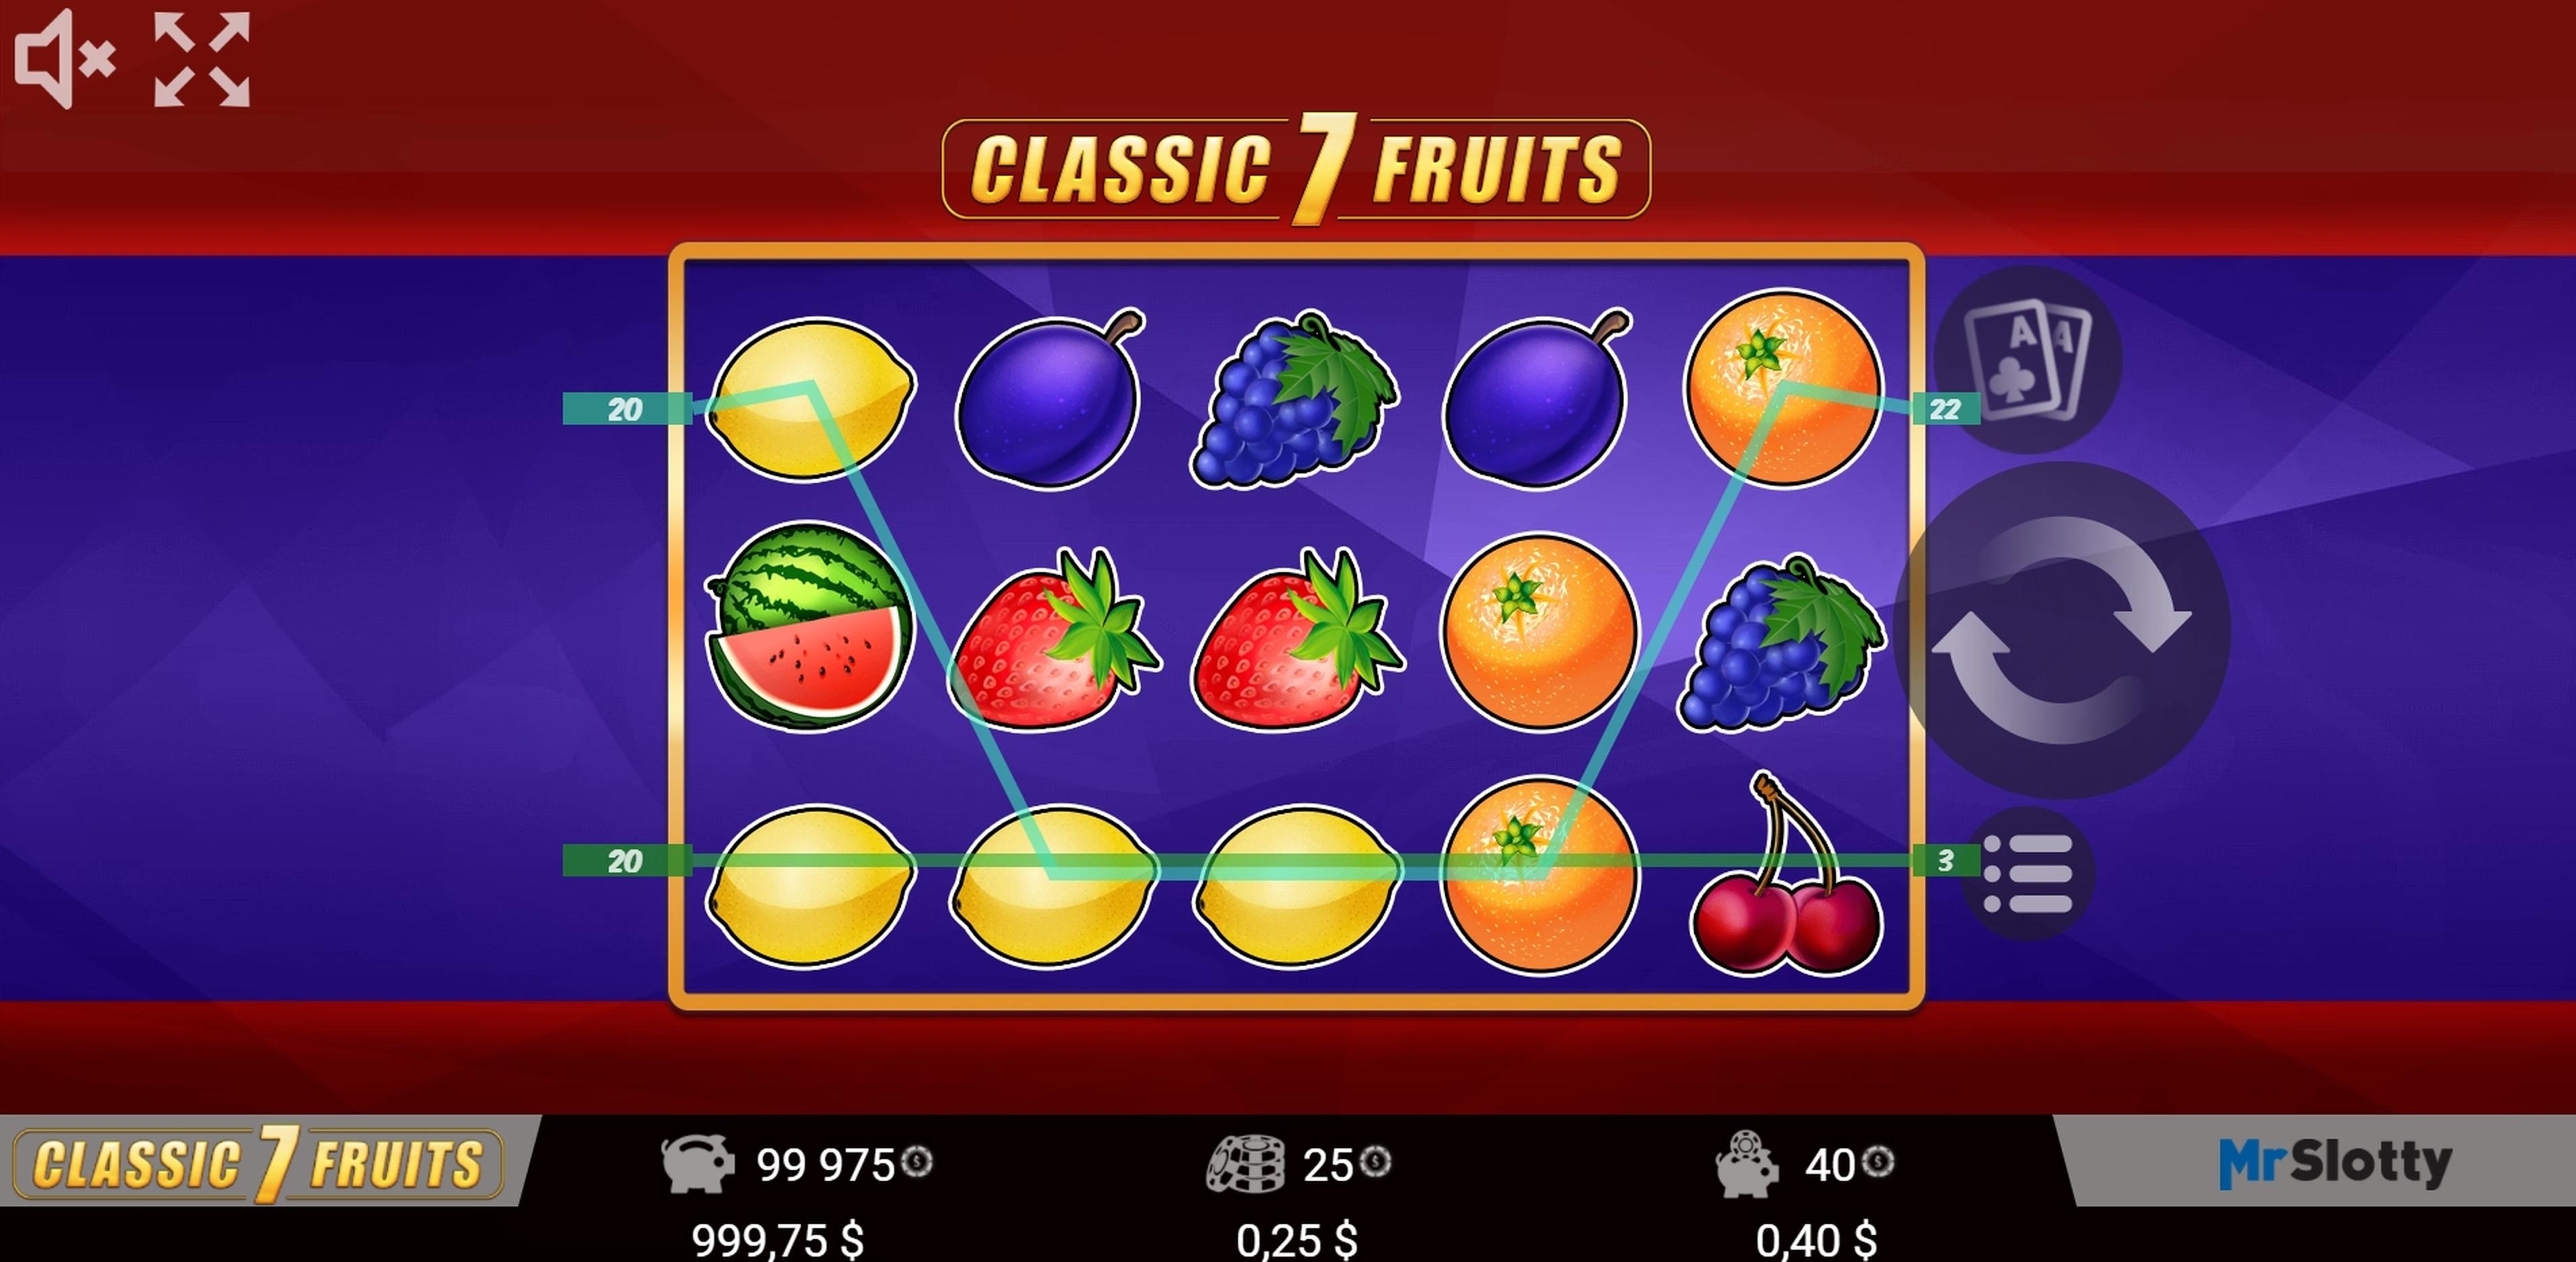 Classic 7 Fruits Slot Machine